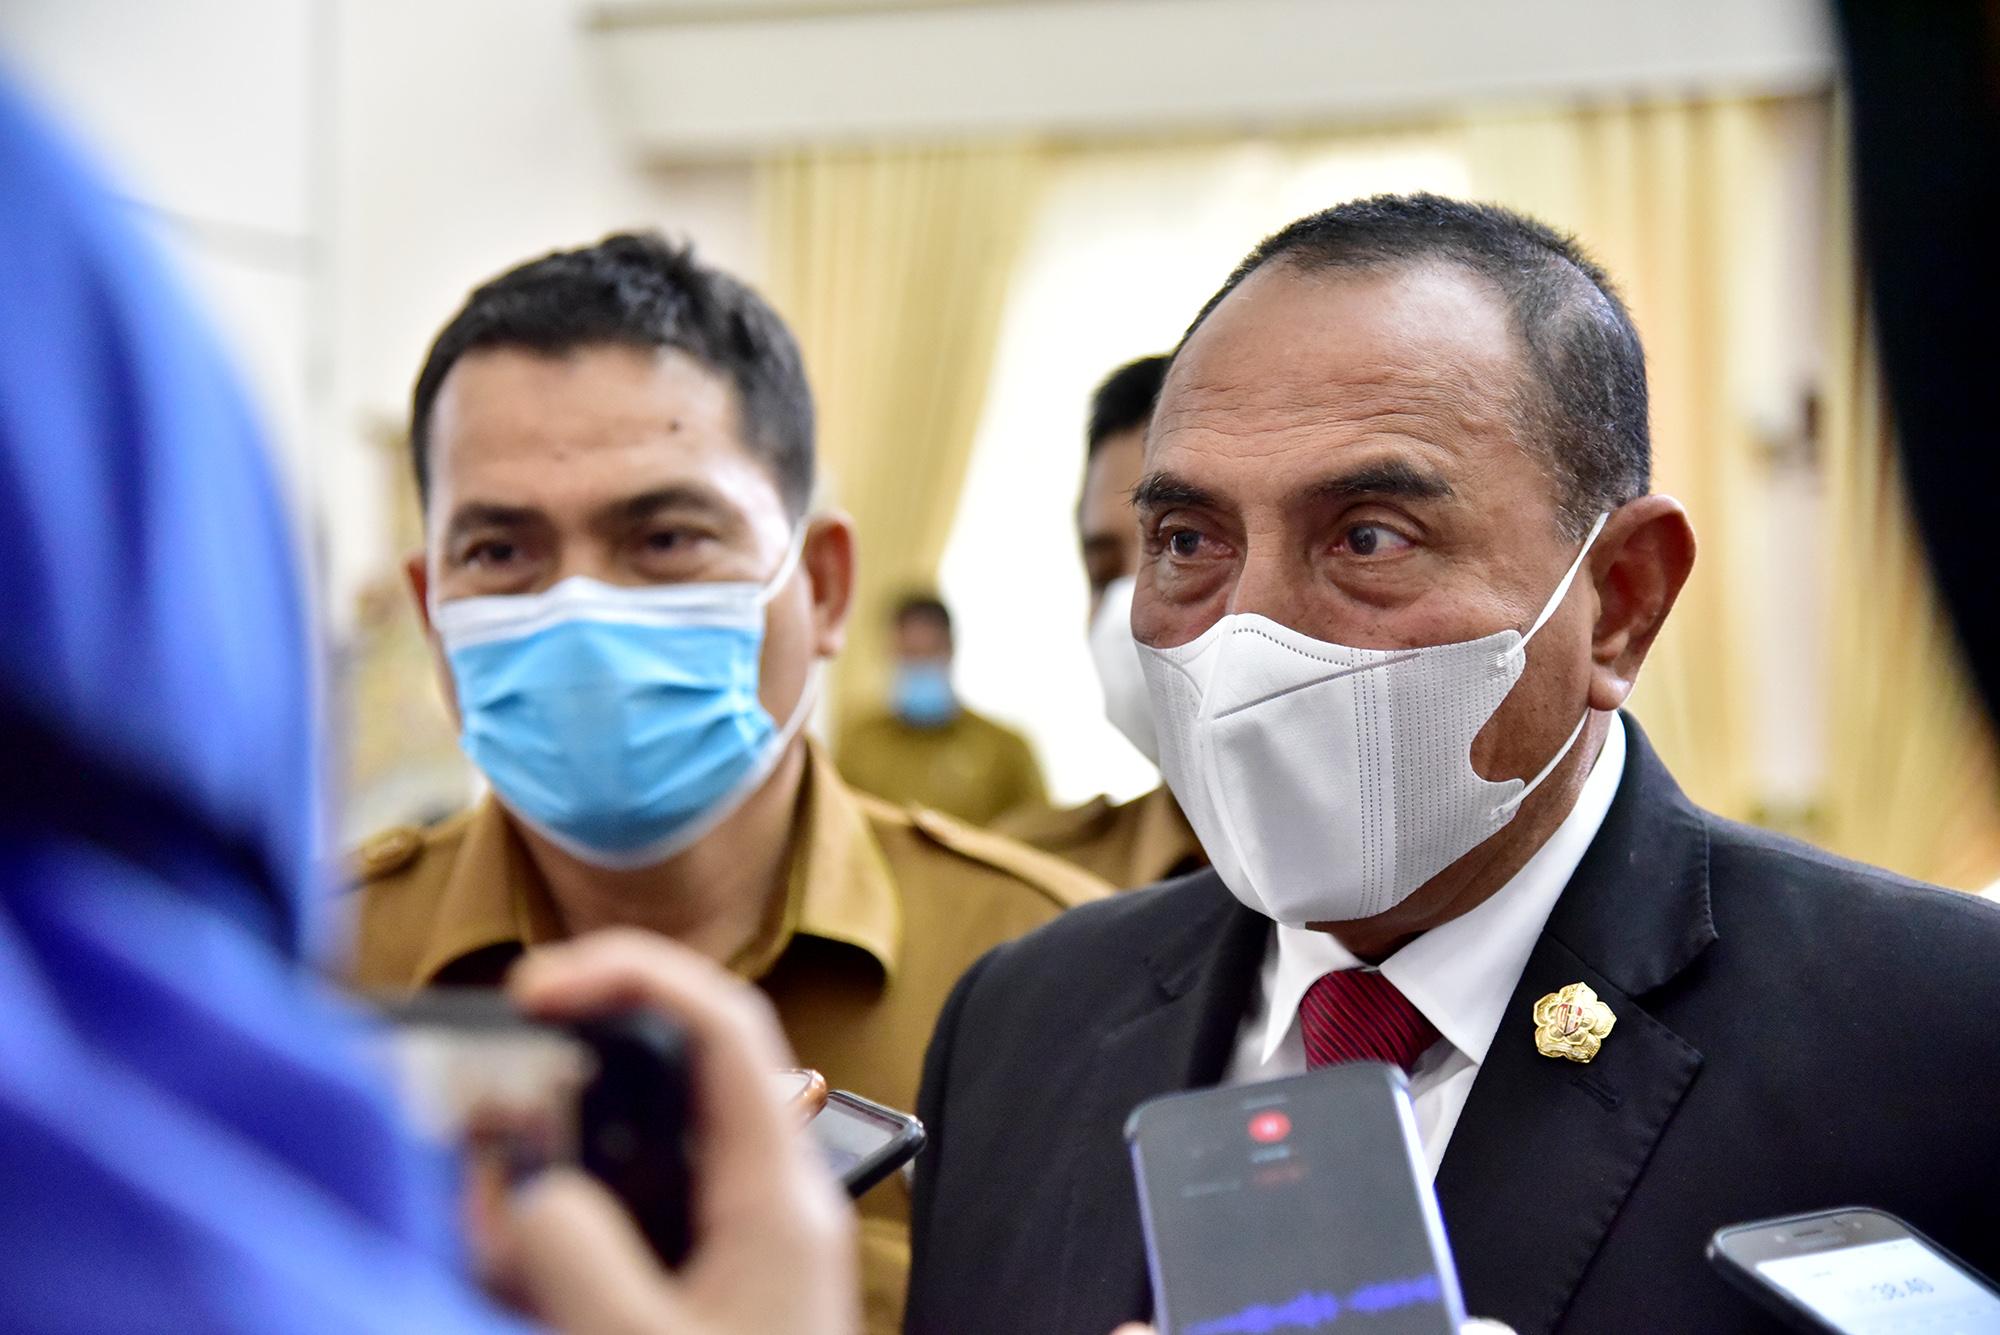 Suntik Vaksin Covid-19 di Sumut, Gubernur Edy SiapJadi yang Pertama